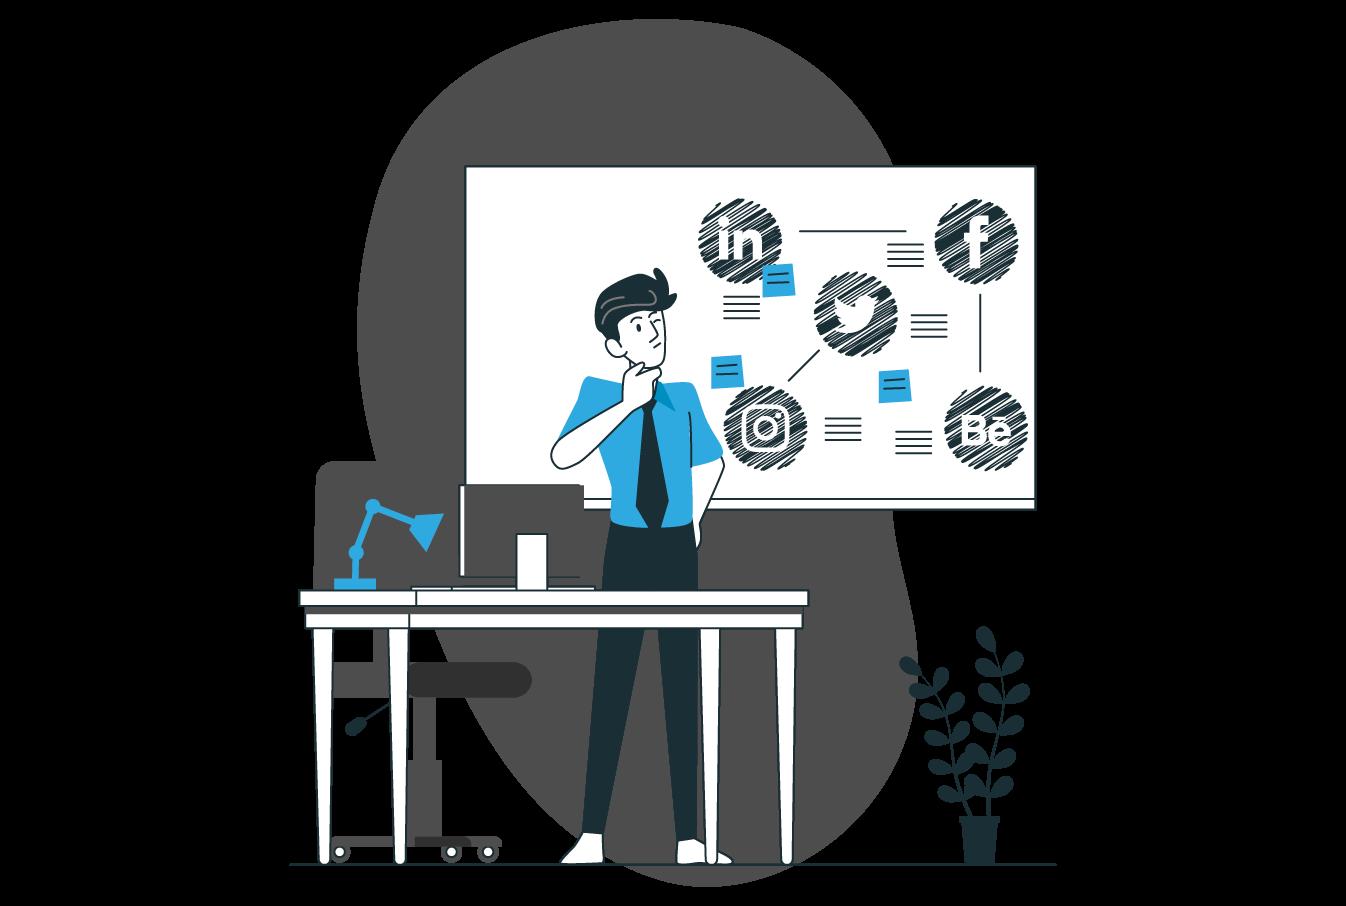 https://dotnokta.com/wp-content/uploads/2021/02/Digital-Marketing-and-Advertising.png